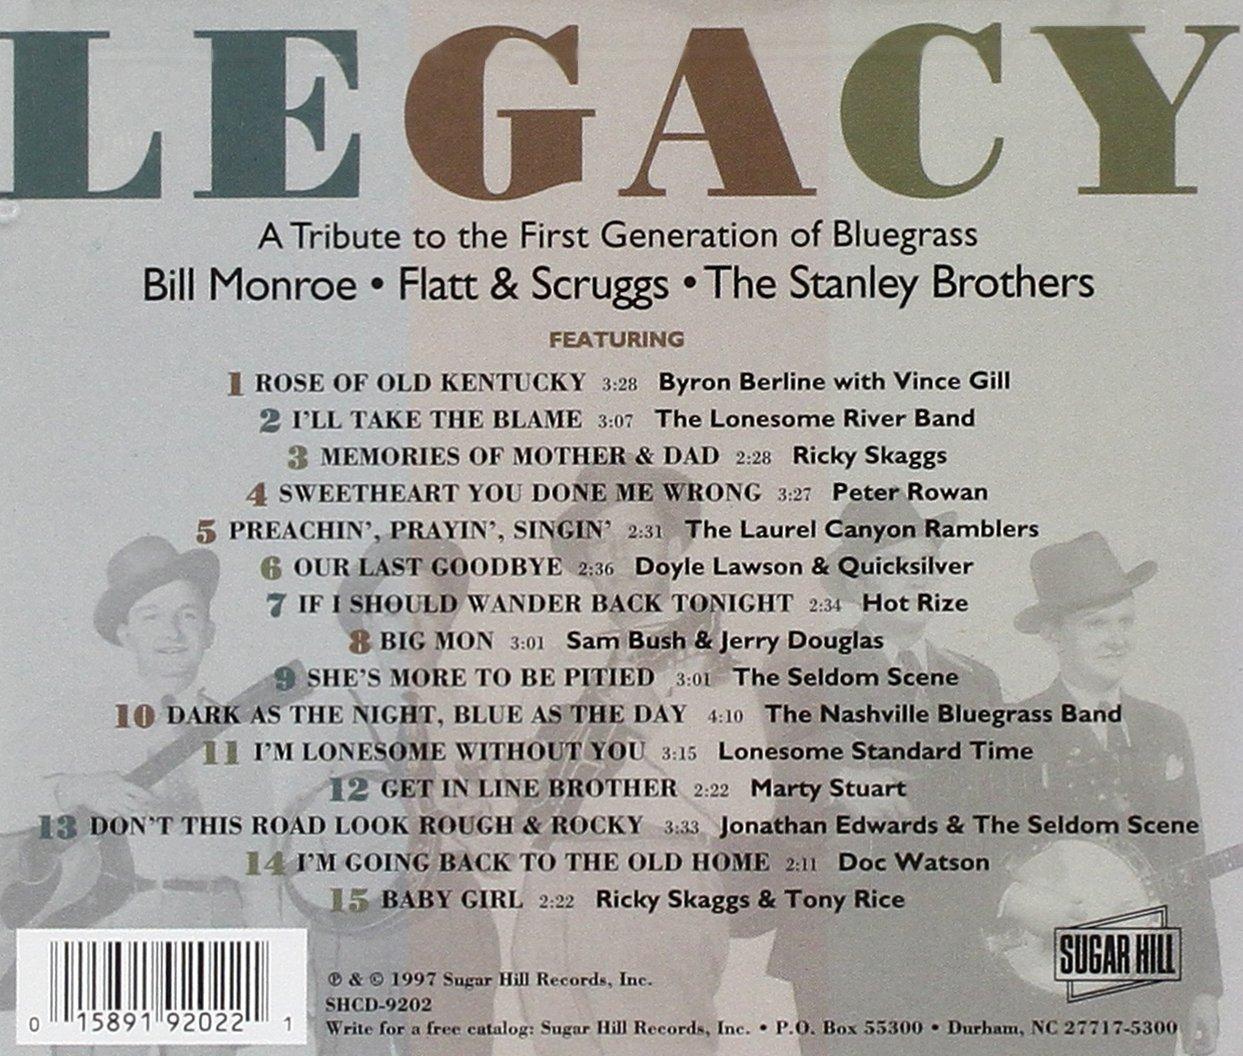 Various Legacy